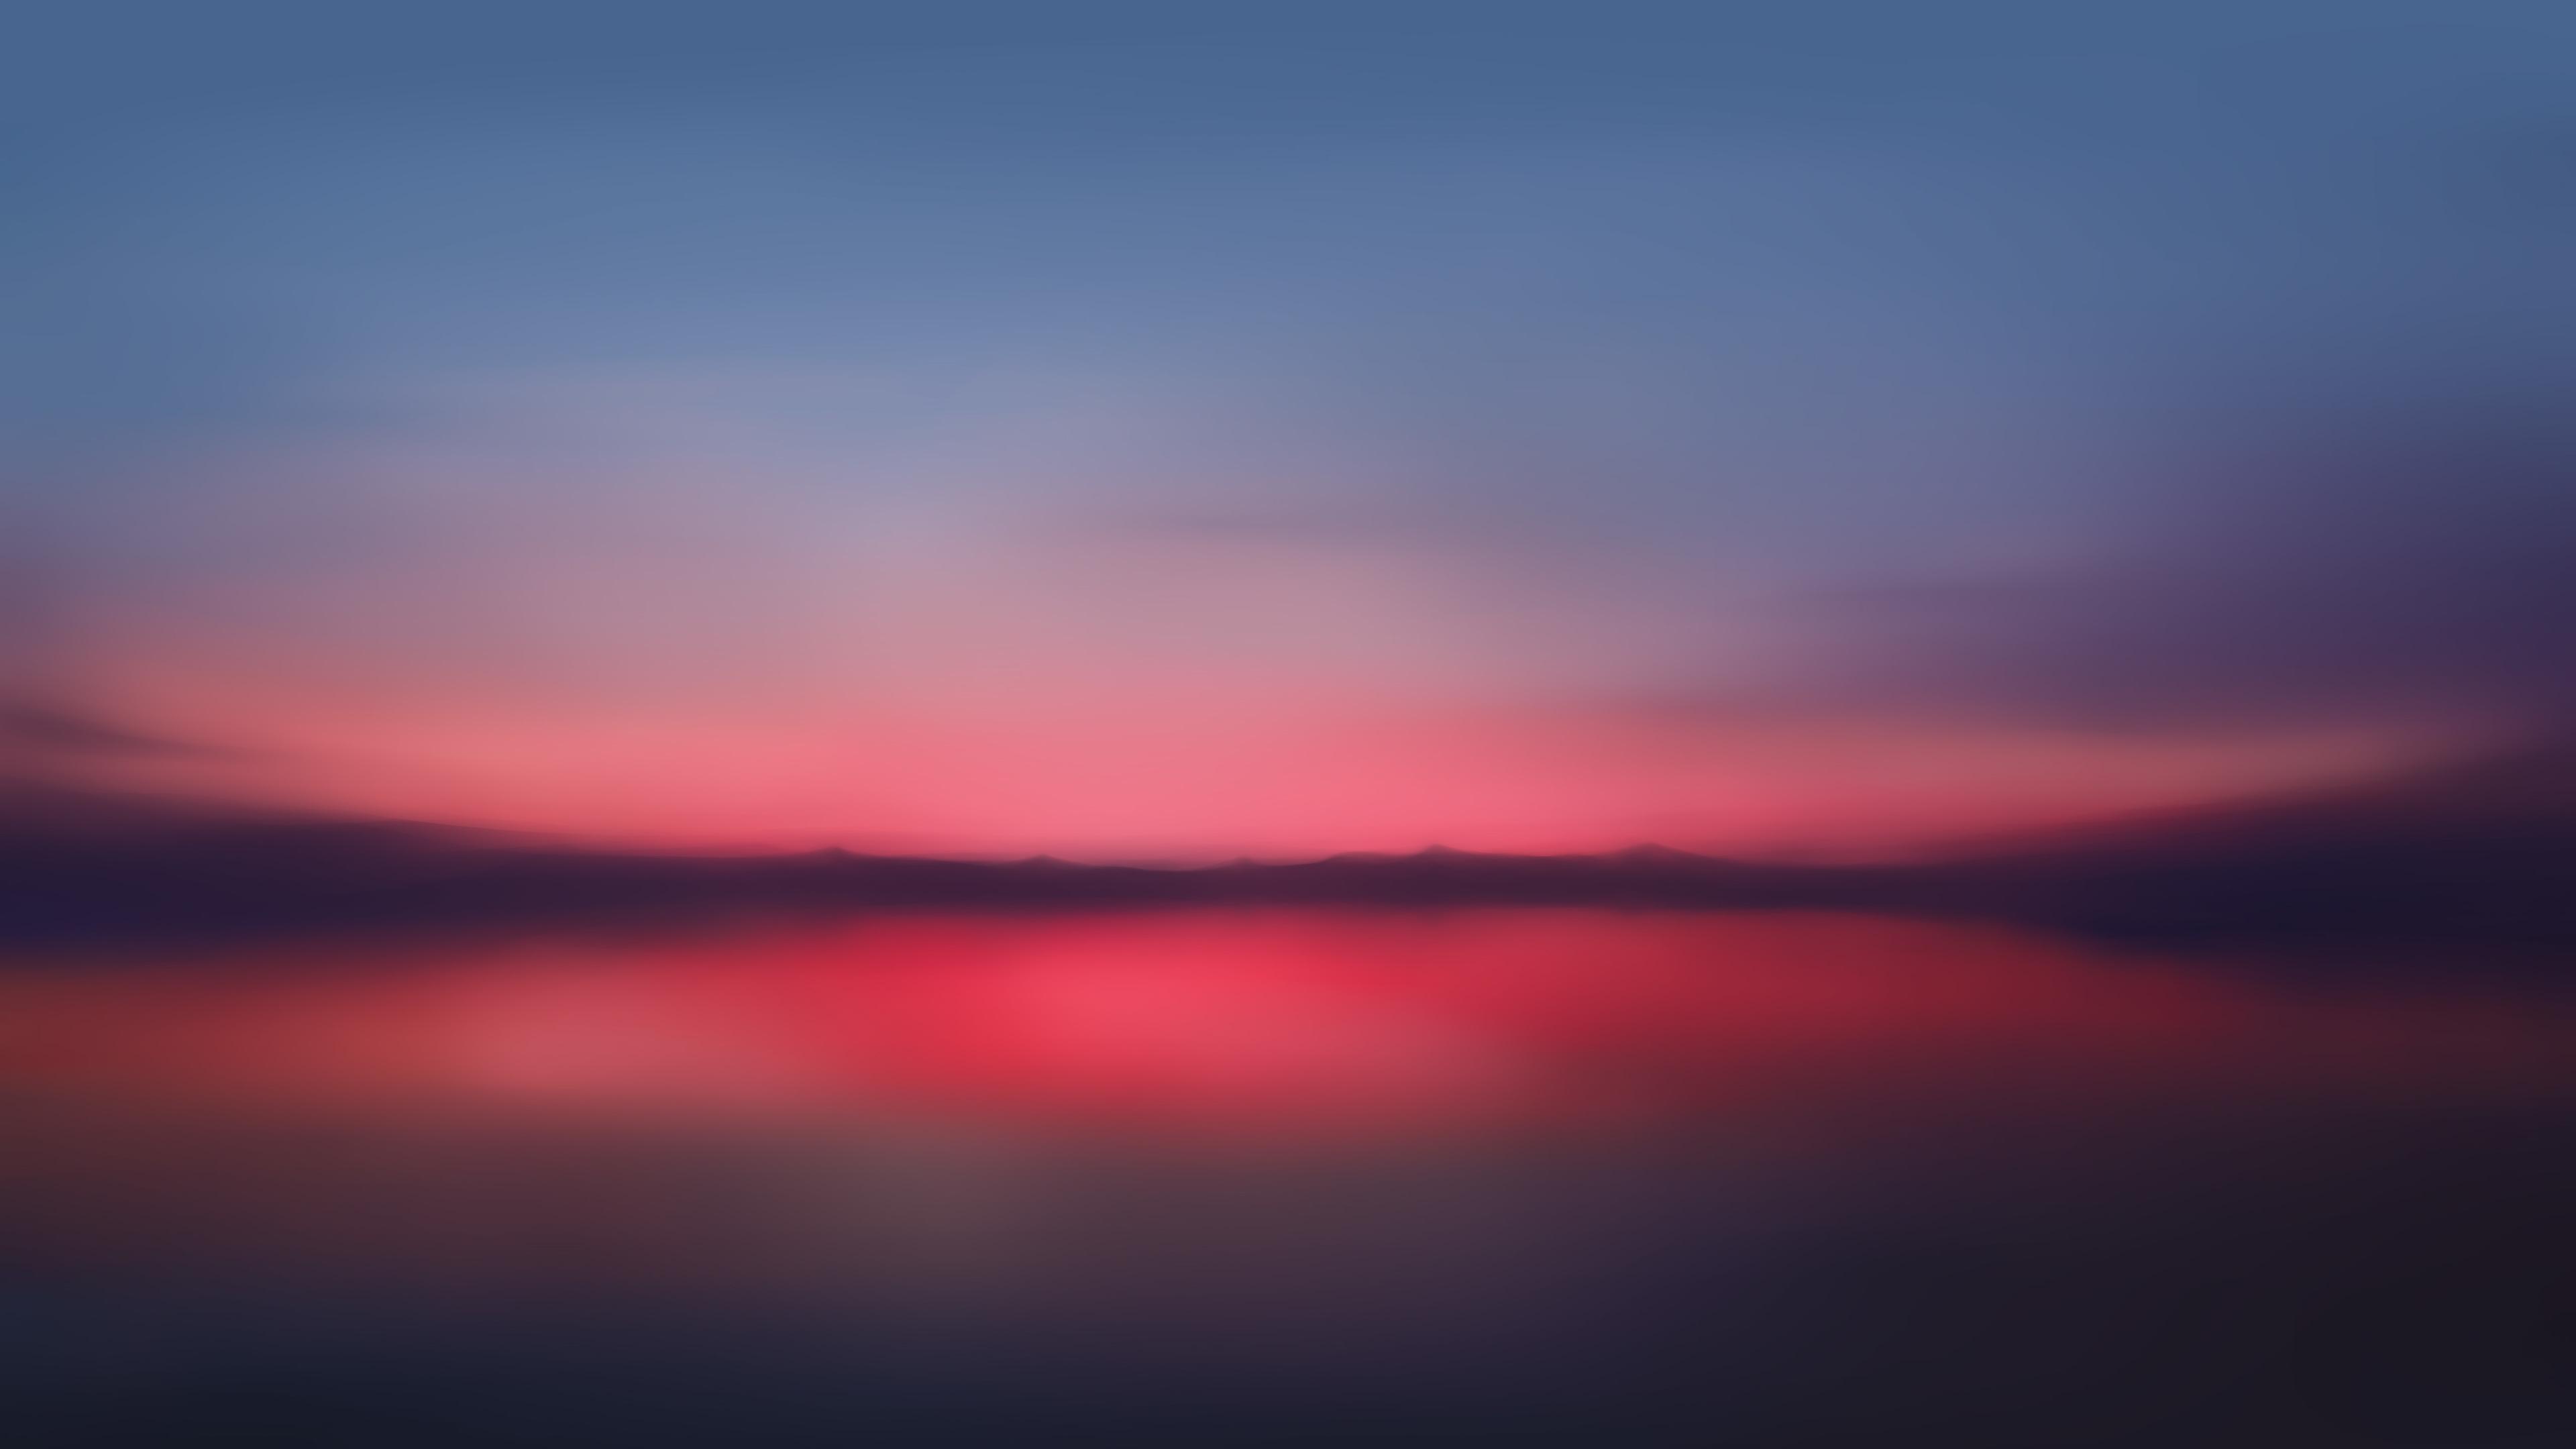 red sunset blur minimalist 5k 1540754983 - Red Sunset Blur Minimalist 5k - minimalist wallpapers, minimalism wallpapers, hd-wallpapers, digital art wallpapers, blur wallpapers, artwork wallpapers, artist wallpapers, 5k wallpapers, 4k-wallpapers